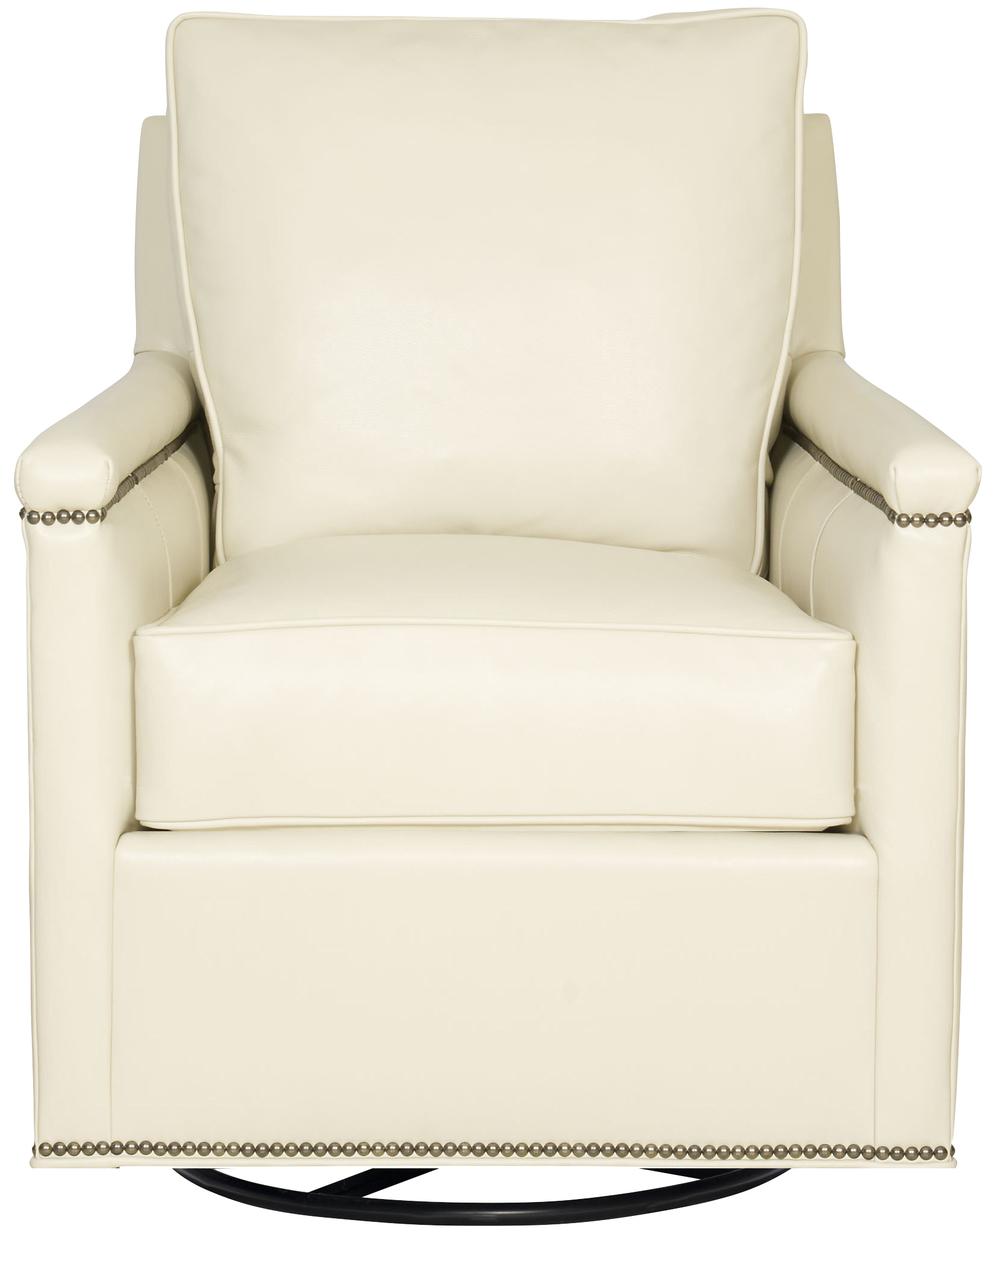 Vanguard Furniture - Liz Swivel Glider